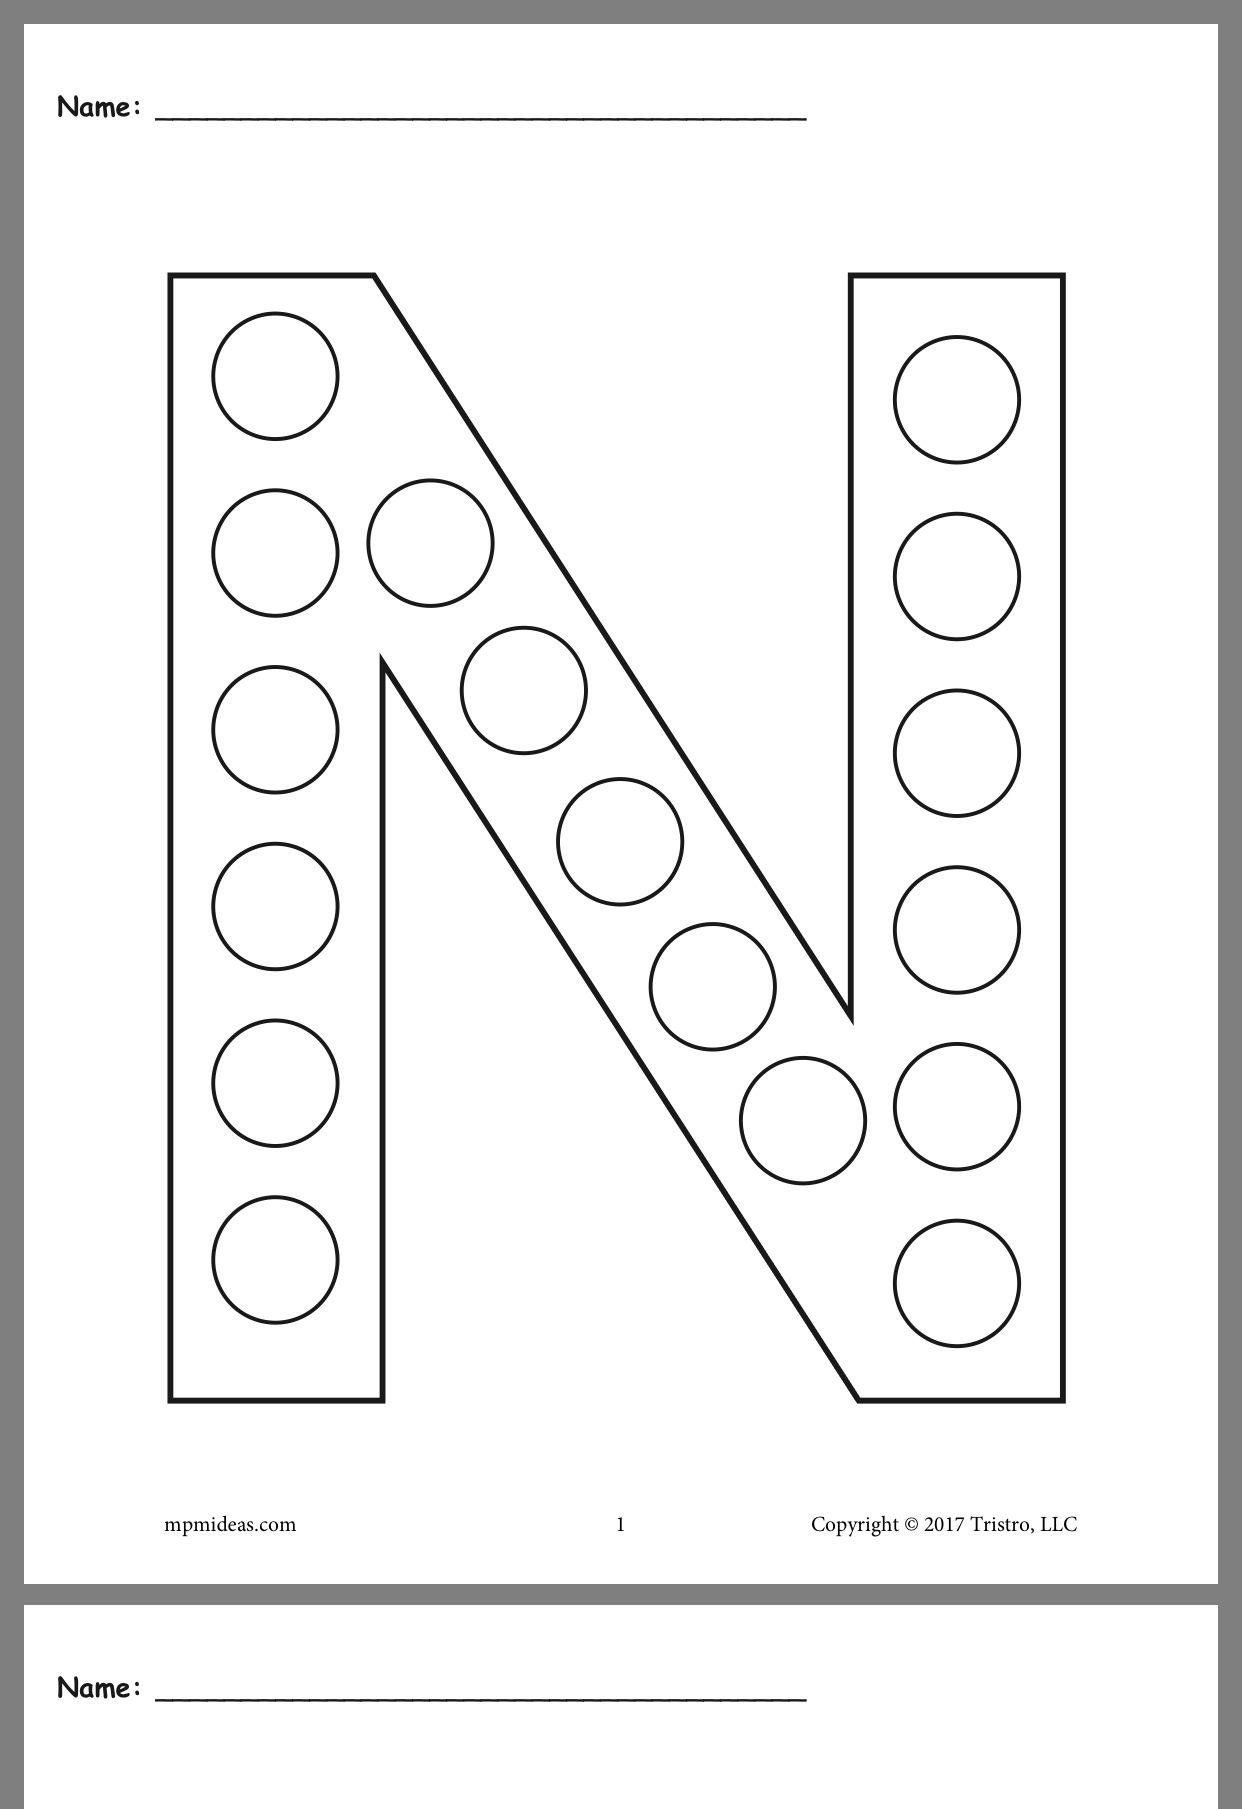 Pin By Lynsey Staner On Preschool Letter N Worksheet Letter A Crafts Letter Worksheets For Preschool